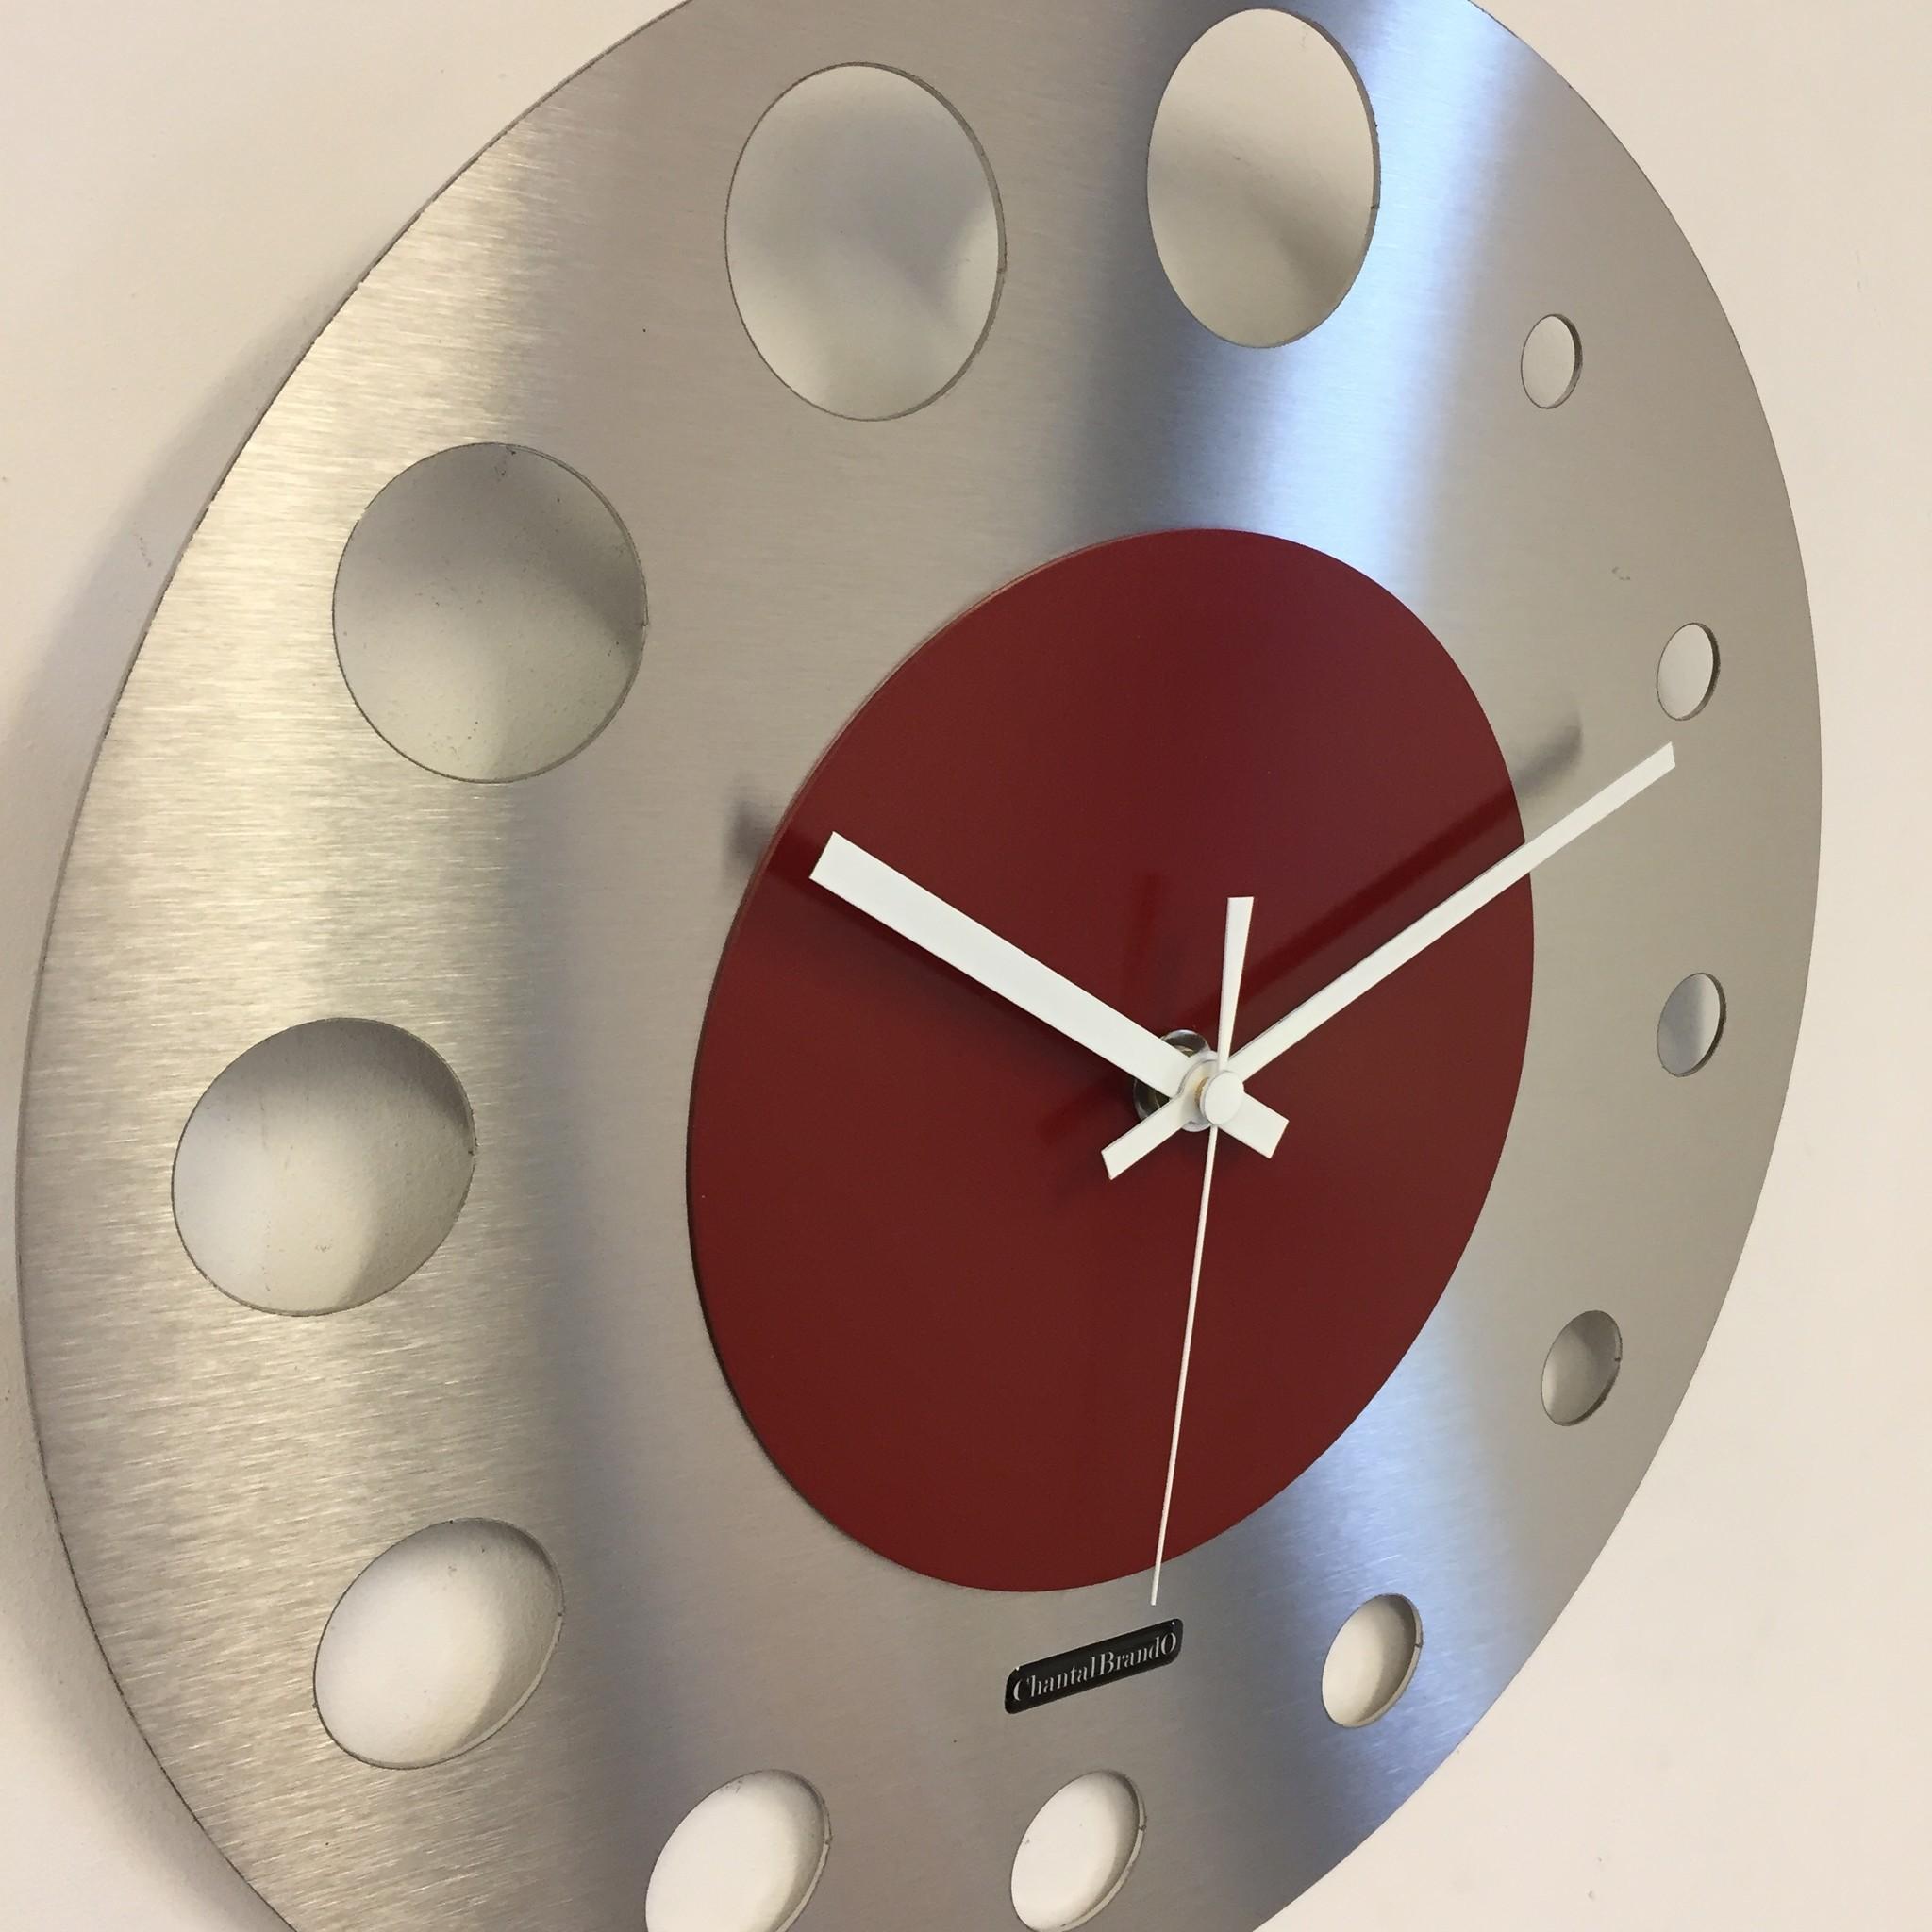 ChantalBrandO Wandklok JUNTE BRUSSEL ATOMIUM RED Modern Design